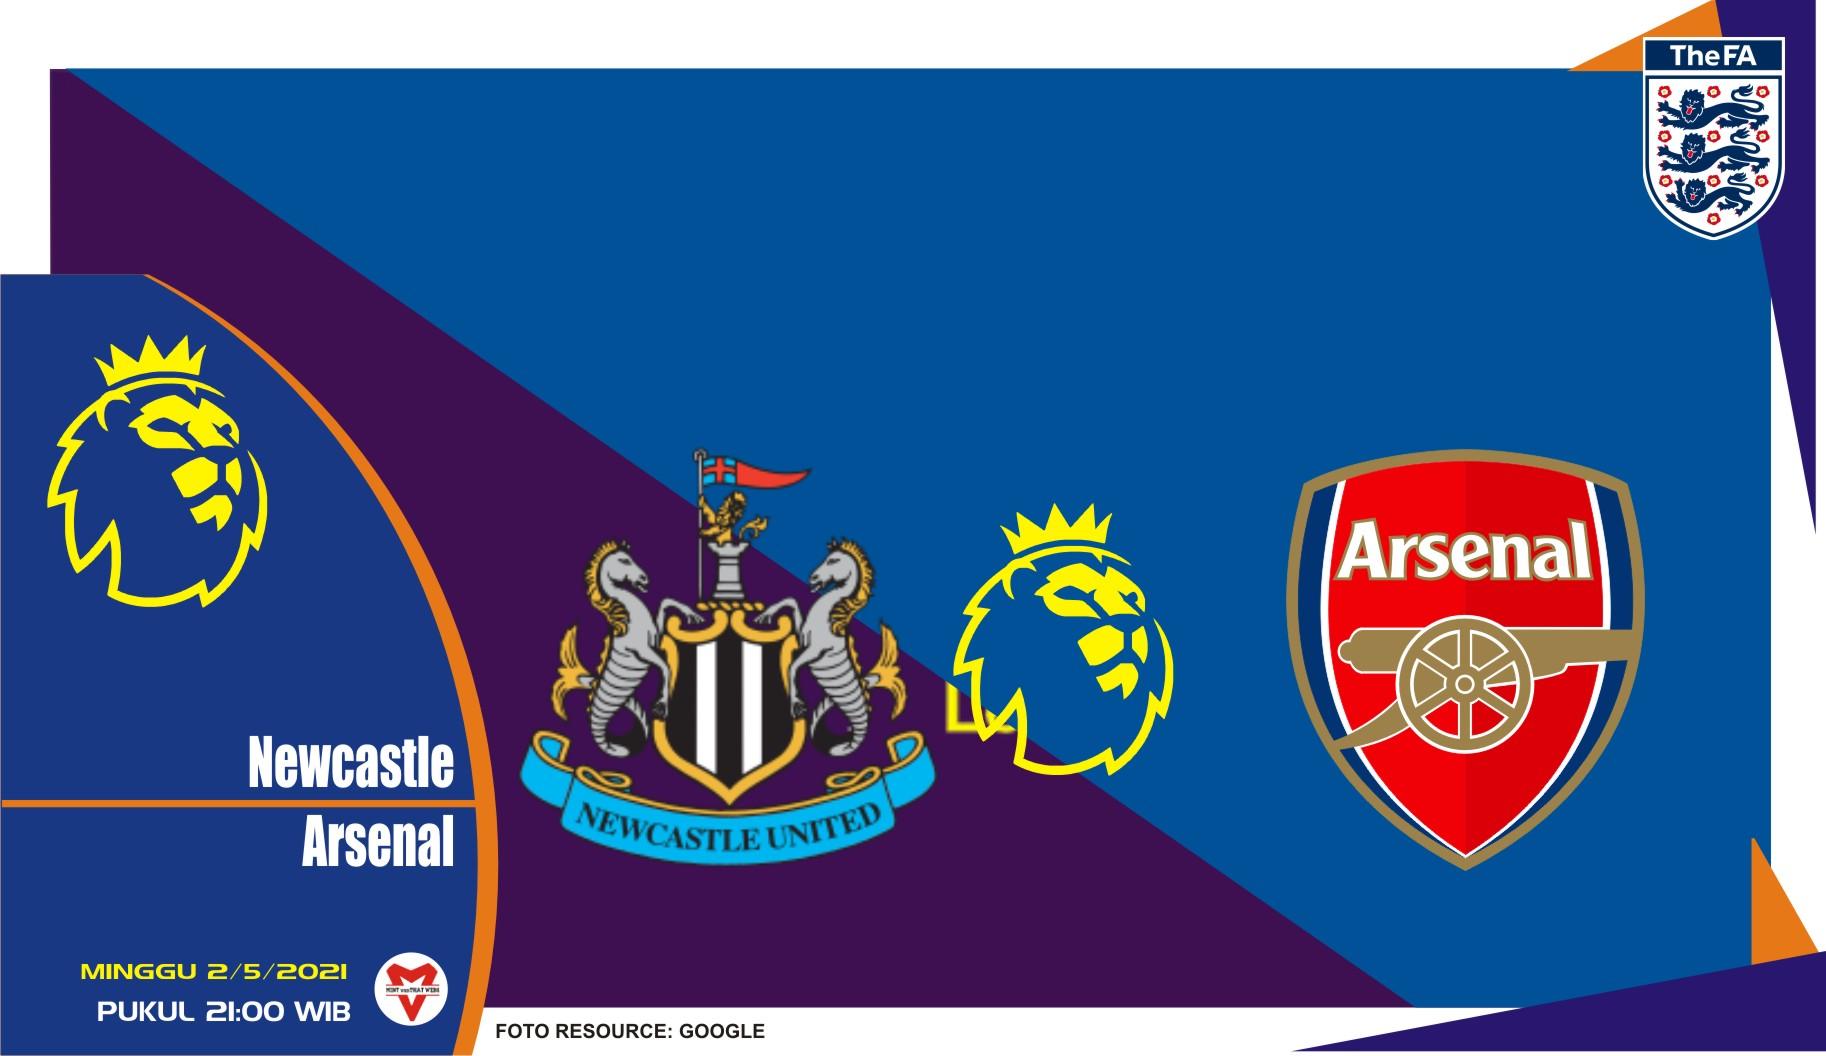 Prediksi Liga Inggris: Newcastle United vs Arsenal - 2 Mei 2021